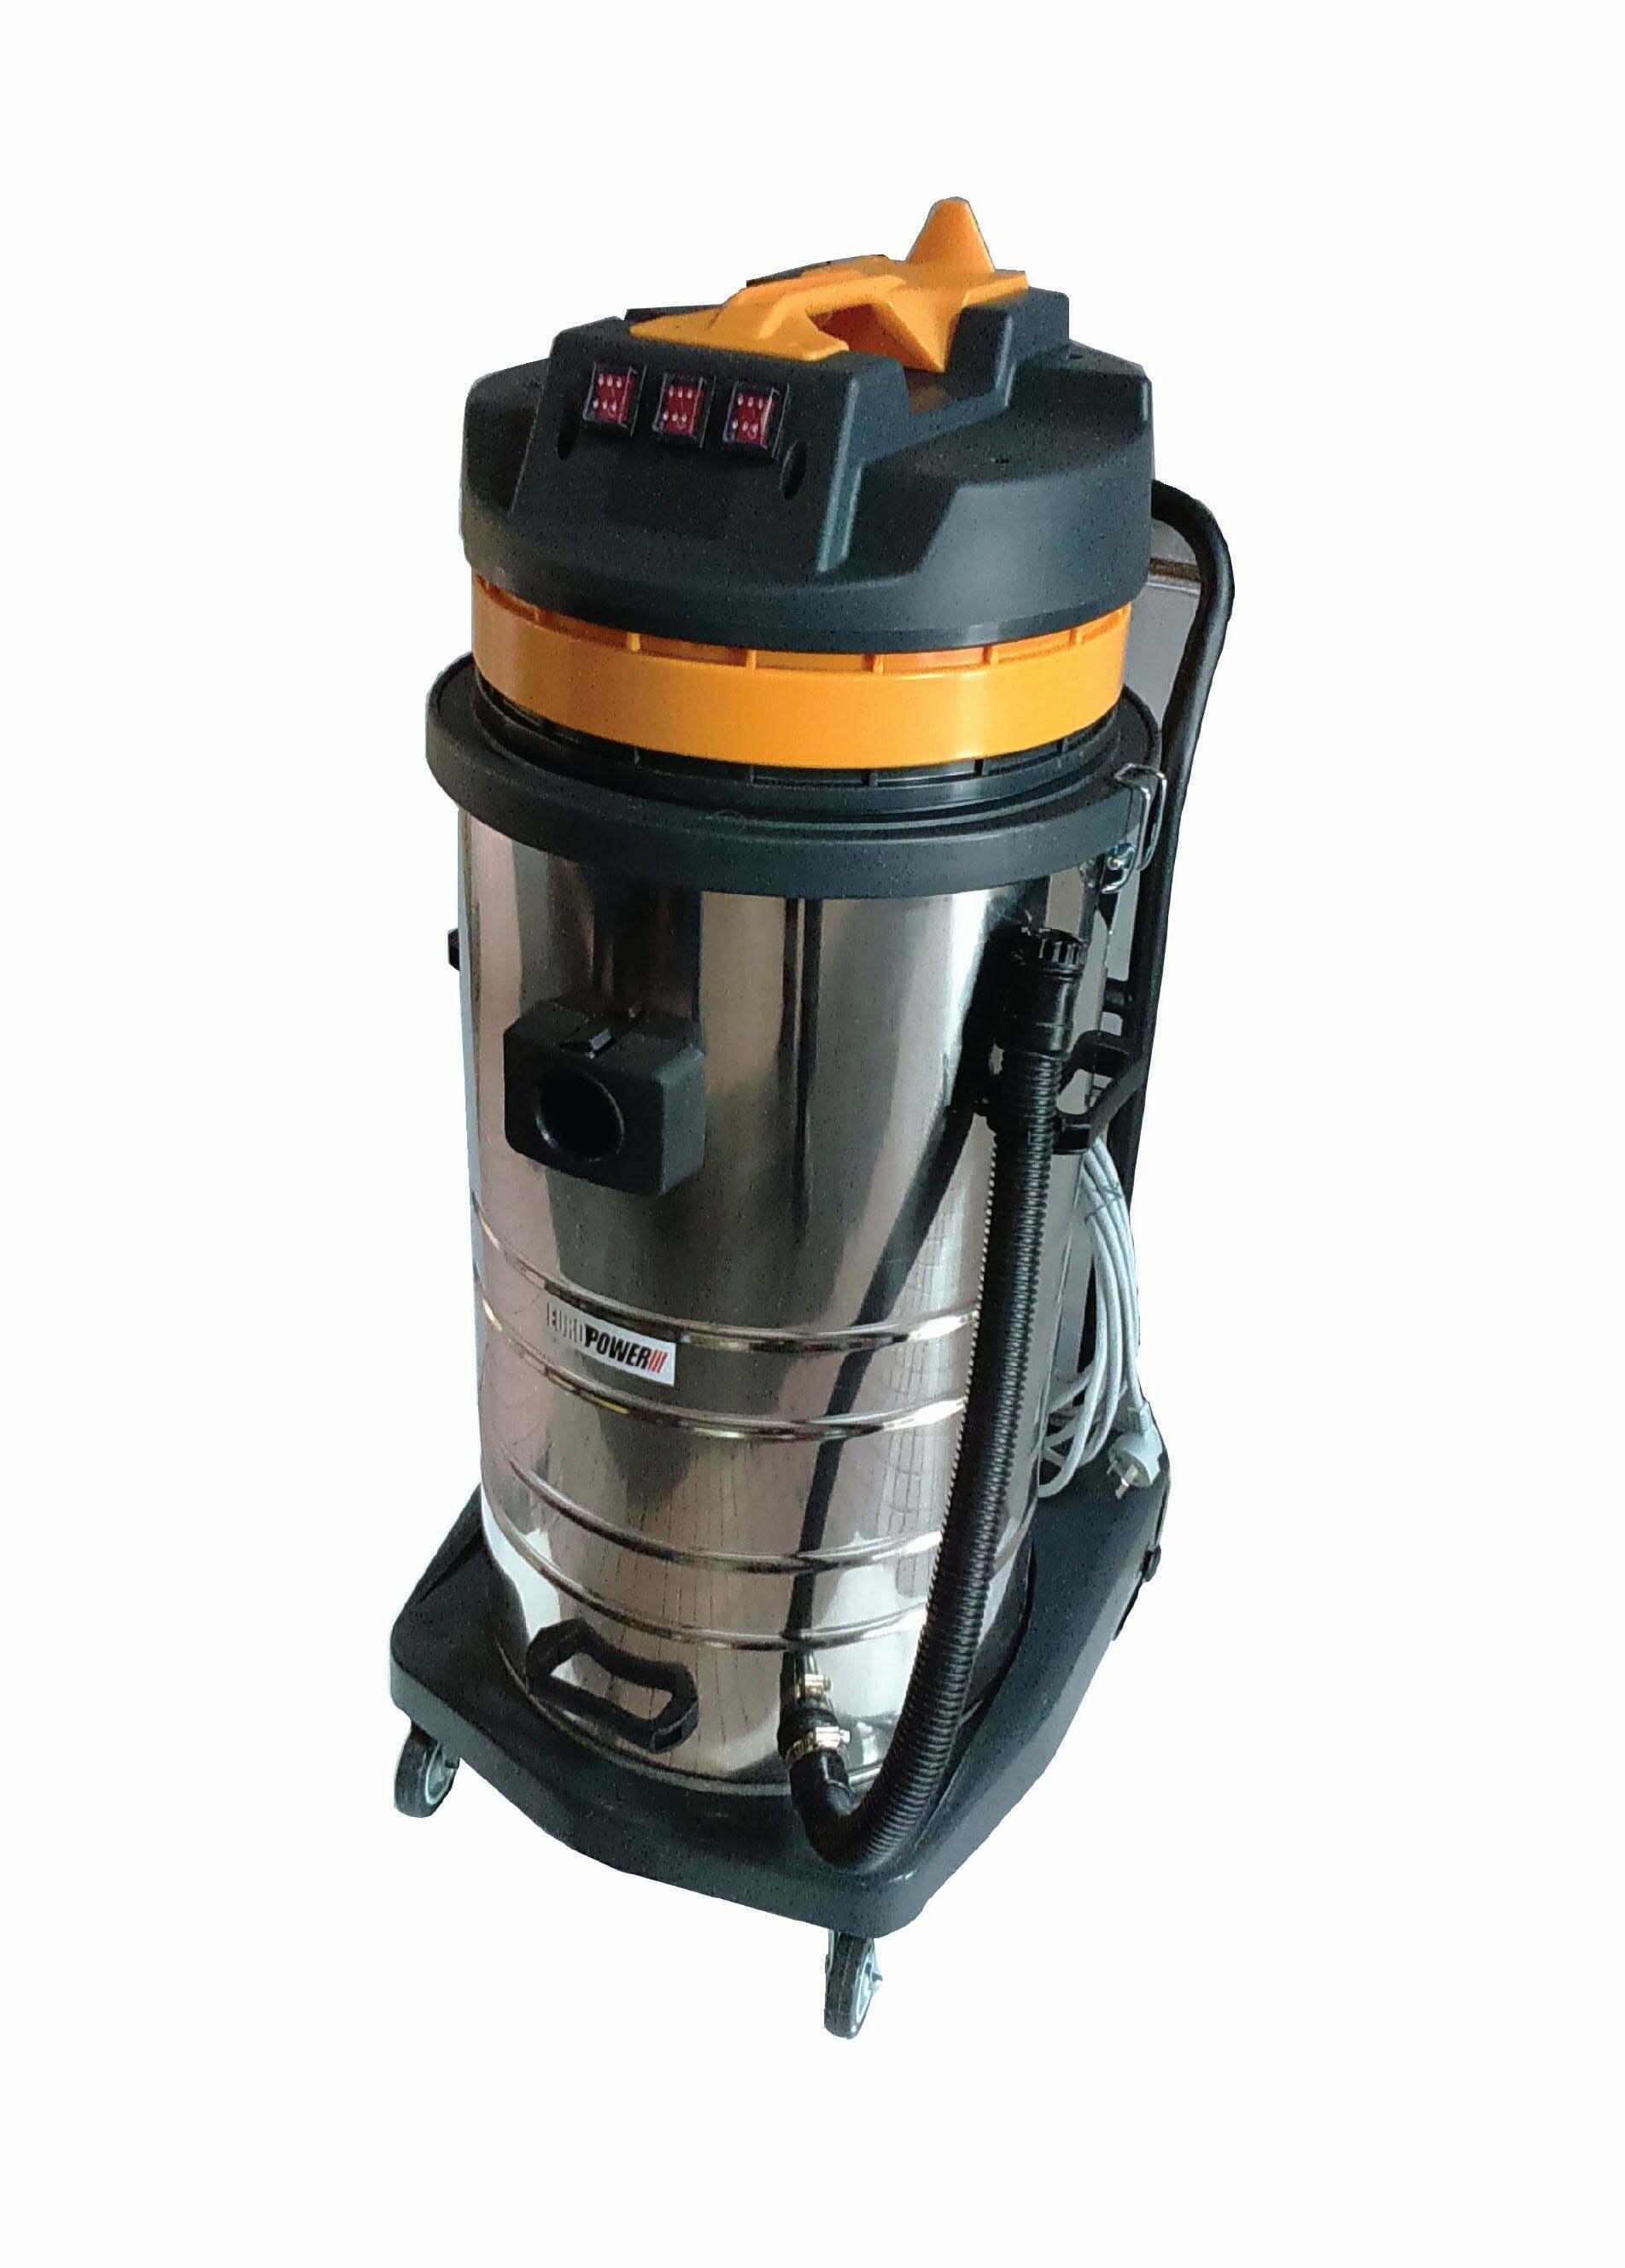 EUROPOWER VAC5001 Vacuum Cleaner